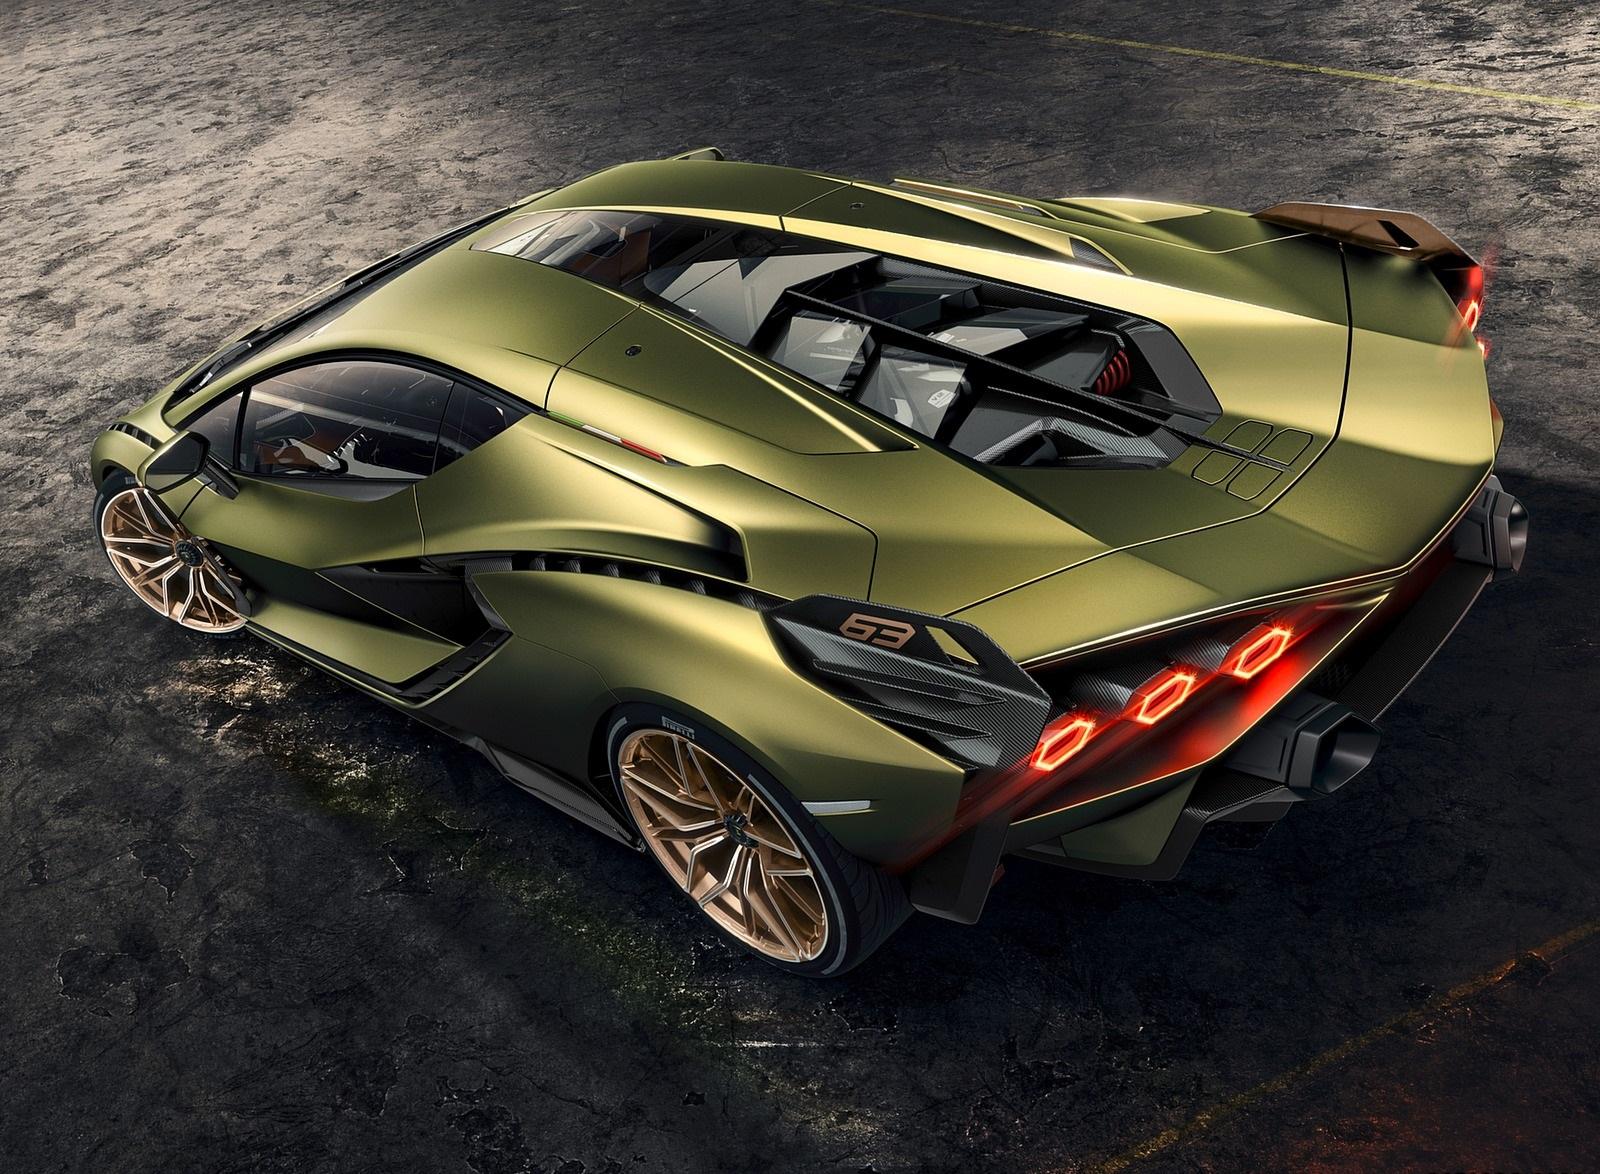 2020 Lamborghini Sián Top Wallpapers (8)